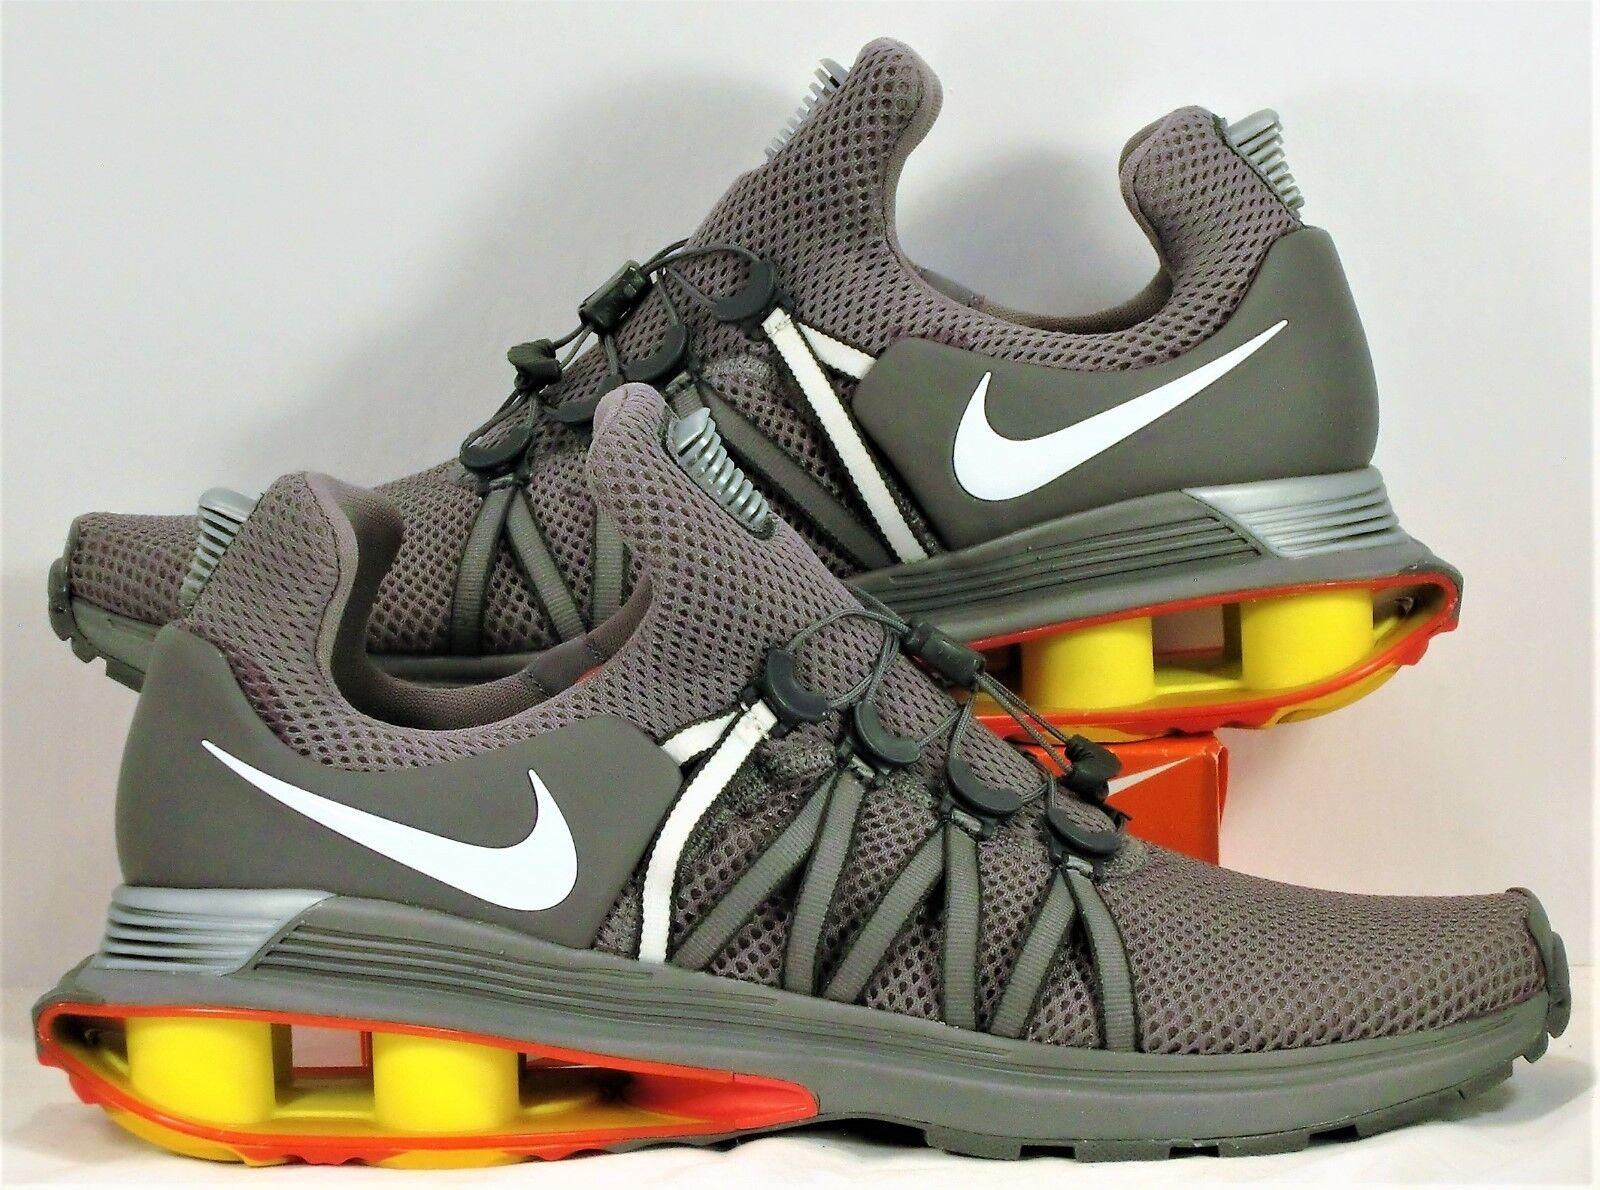 Nike Shox Gravity Gunsmoke & White Training Running Shoes Sz 12 NEW AQ8553 006 Seasonal clearance sale